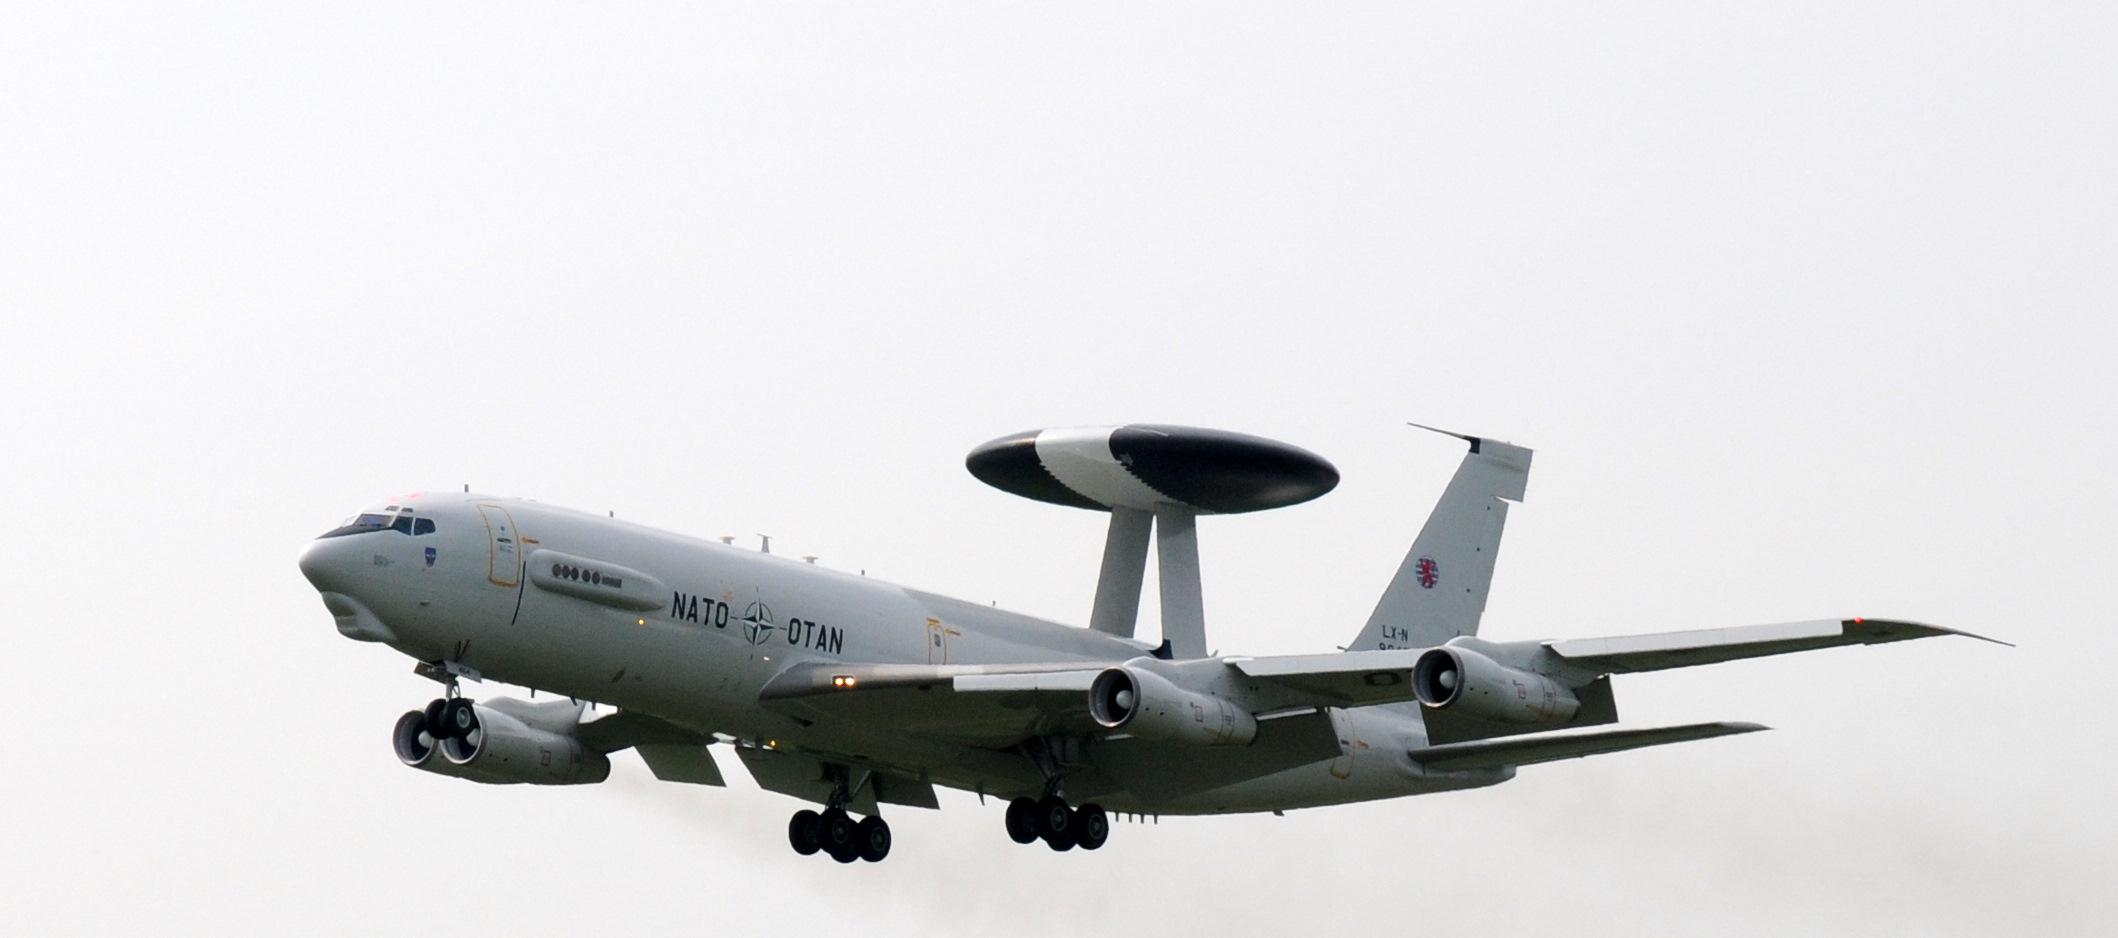 E3 Sentry AWACS